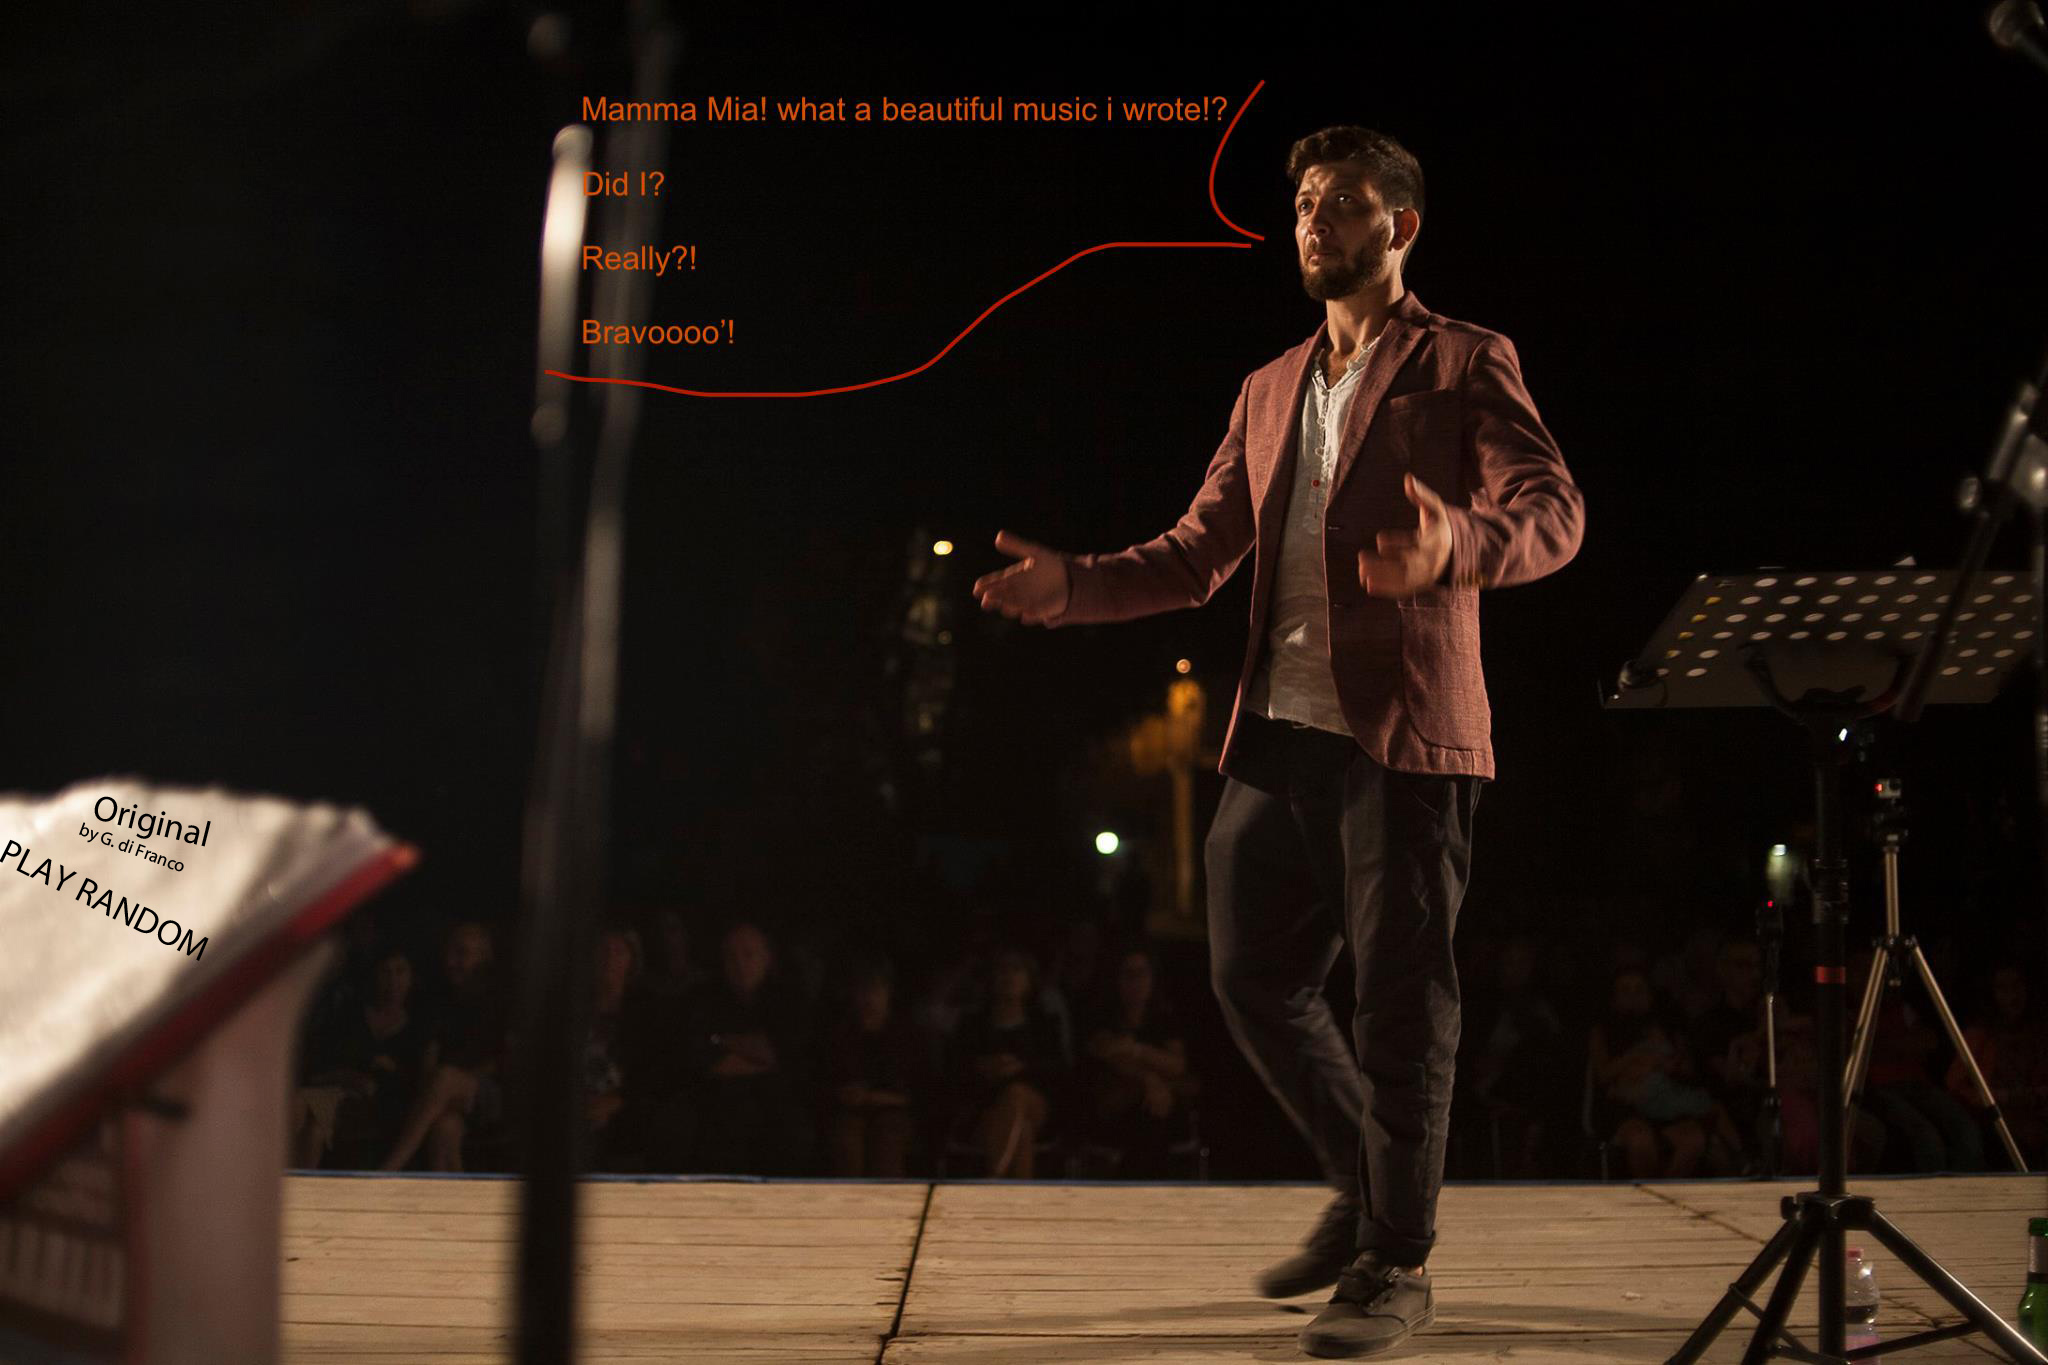 gab conducting